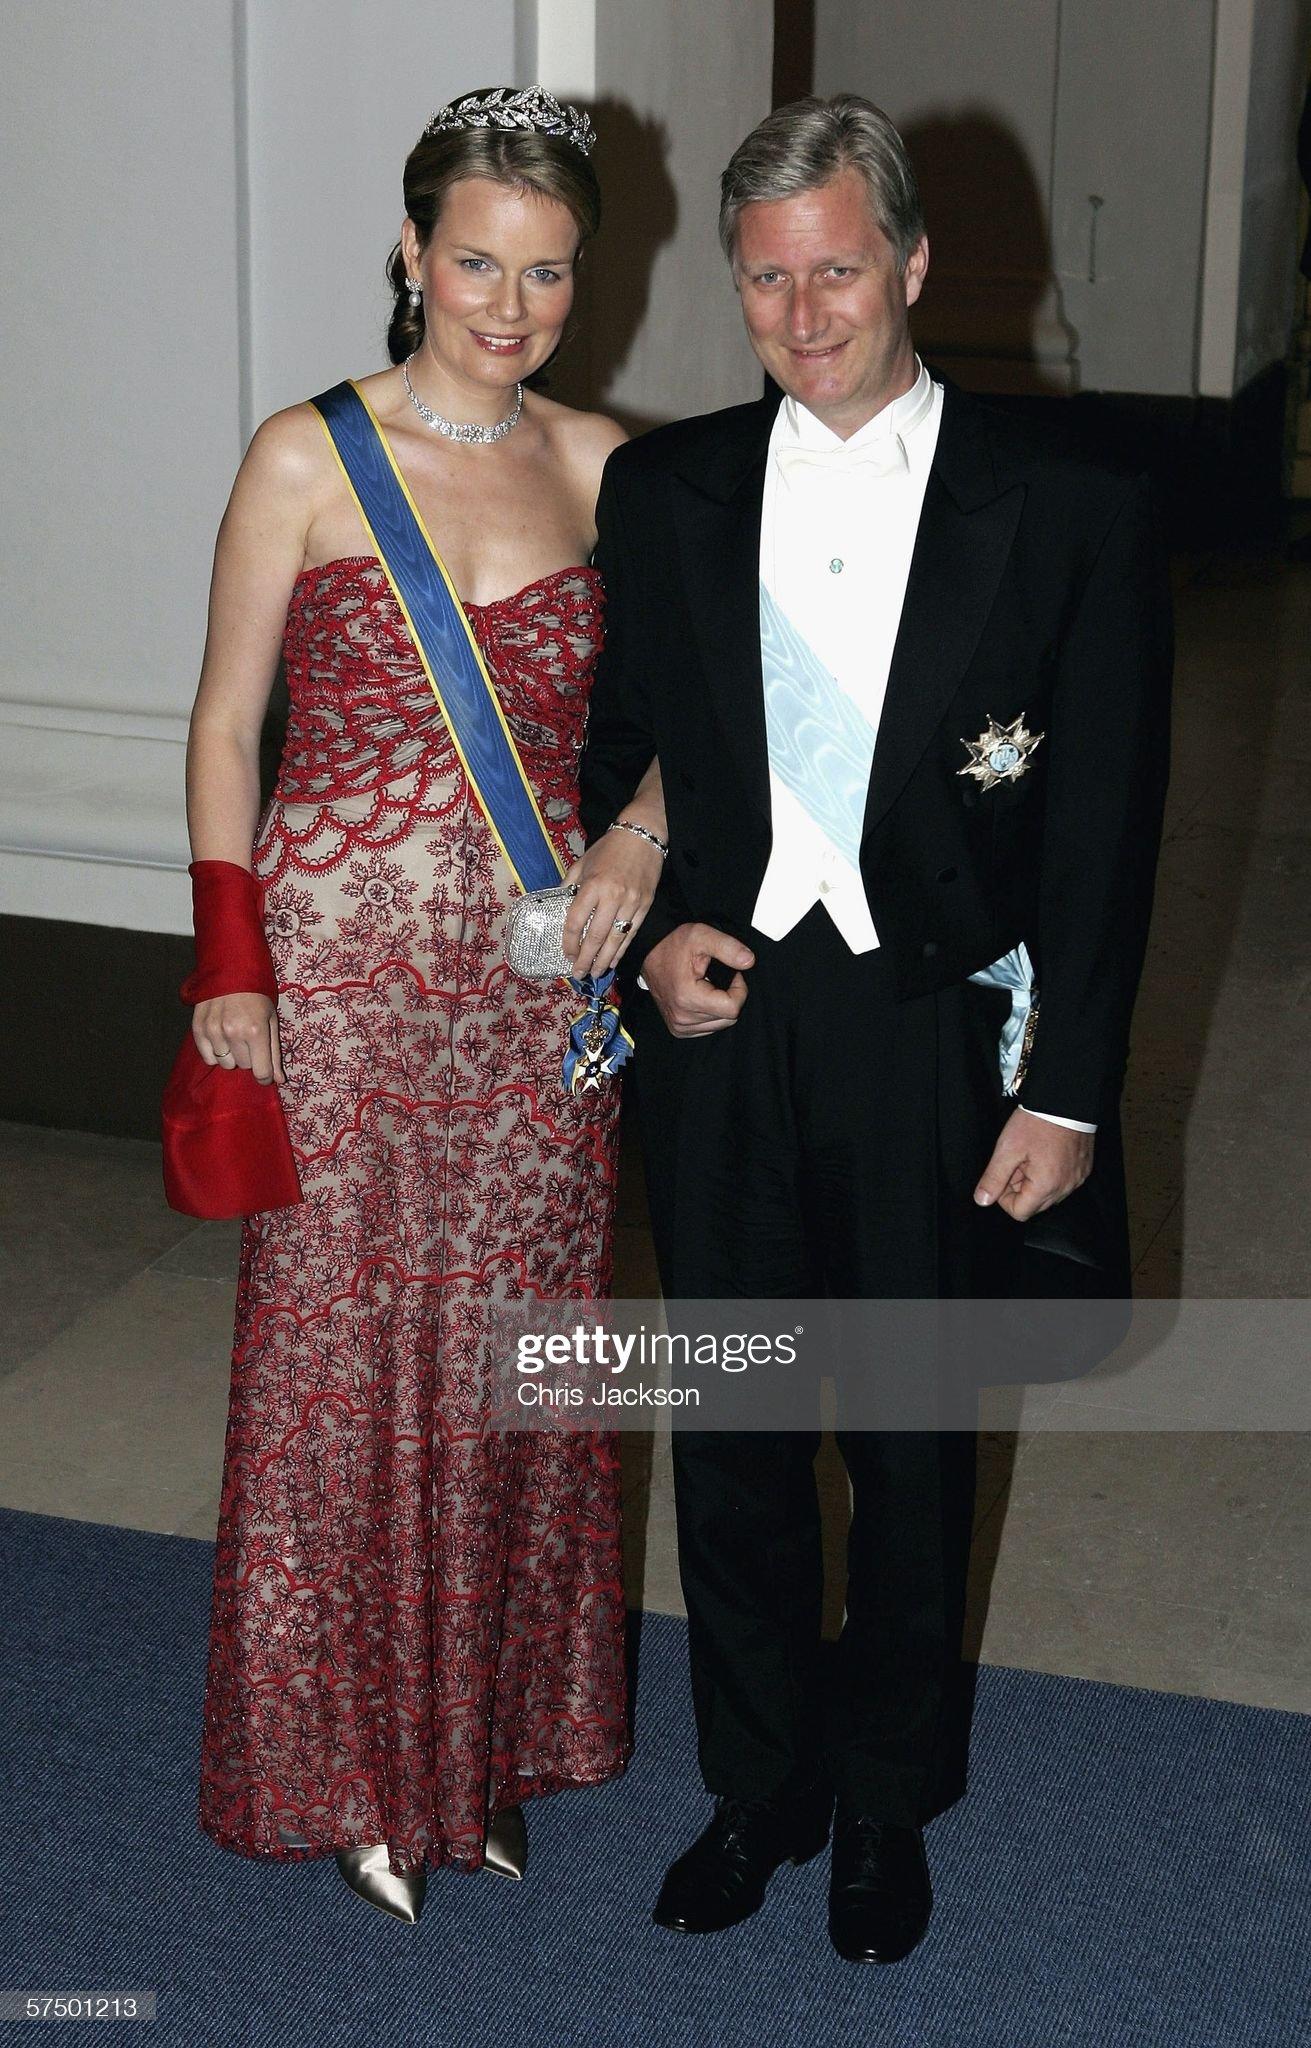 Вечерние наряды Королевы Матильды King Carl Gustaf Of Sweden Celebrates His 60th Birthday : News Photo